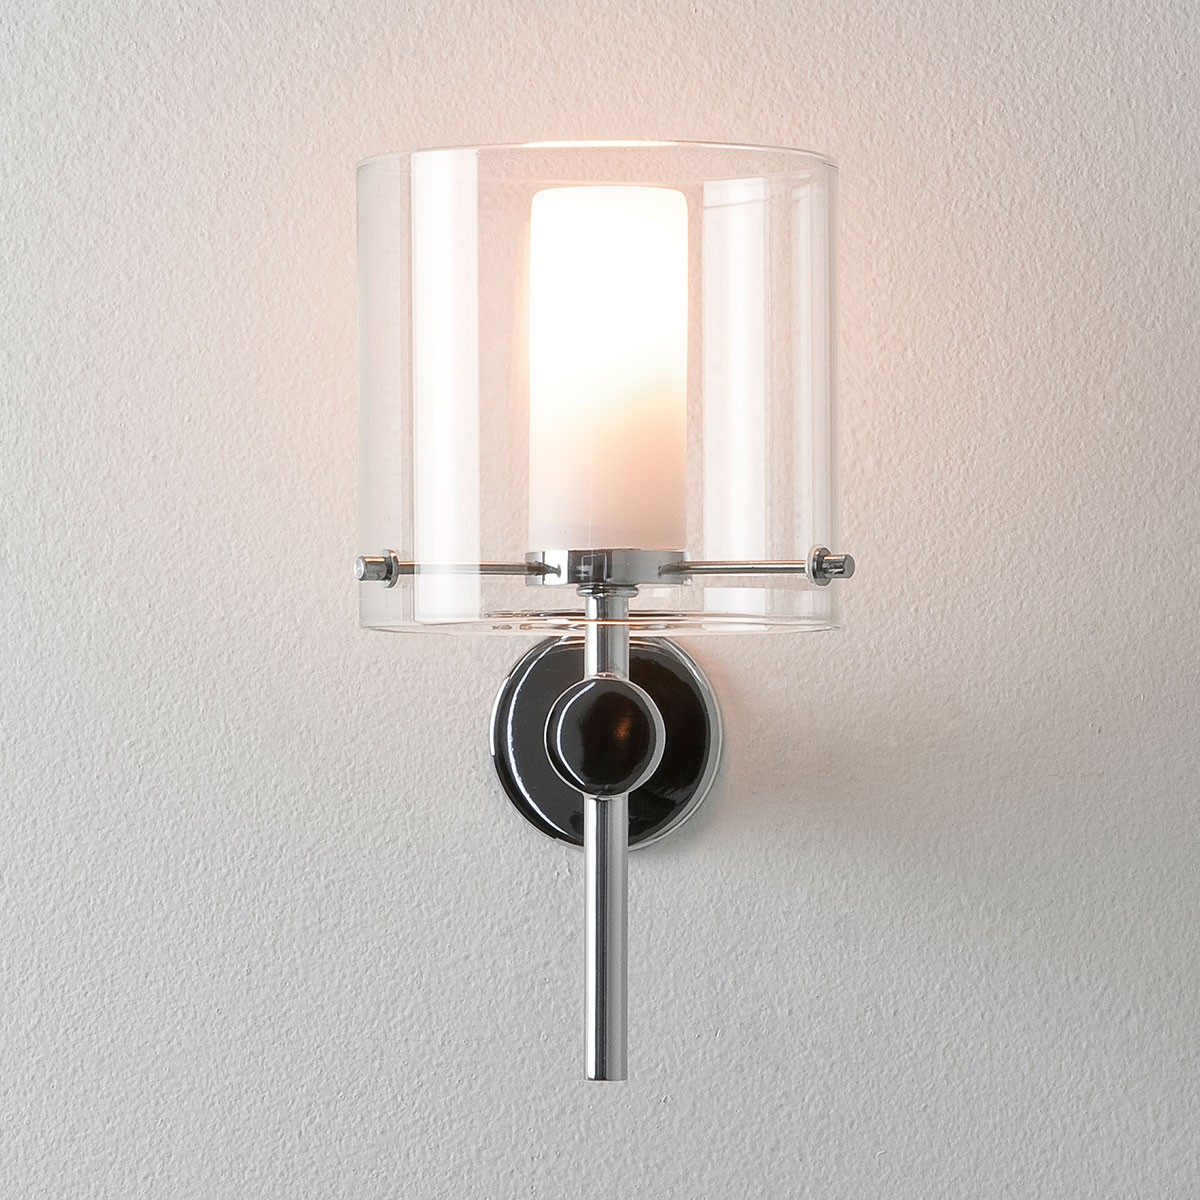 Astro Arezzo Polished Chrome Bathroom Wall Light At Uk